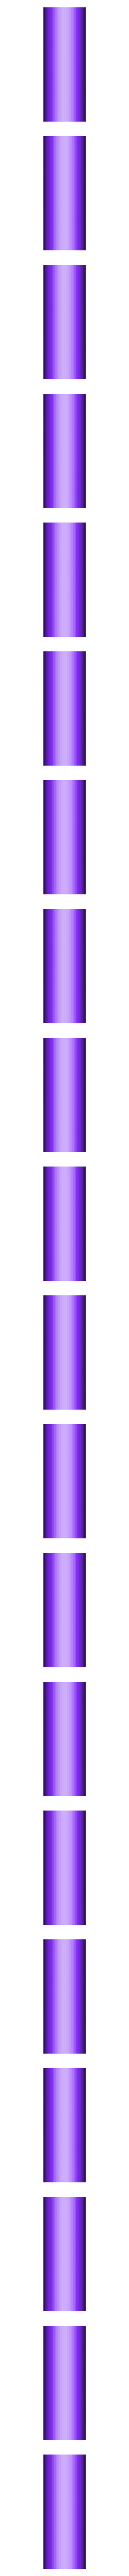 pin.stl Download free STL file Rope tensioner (cam) fully printed • 3D printing object, dvilleneuve